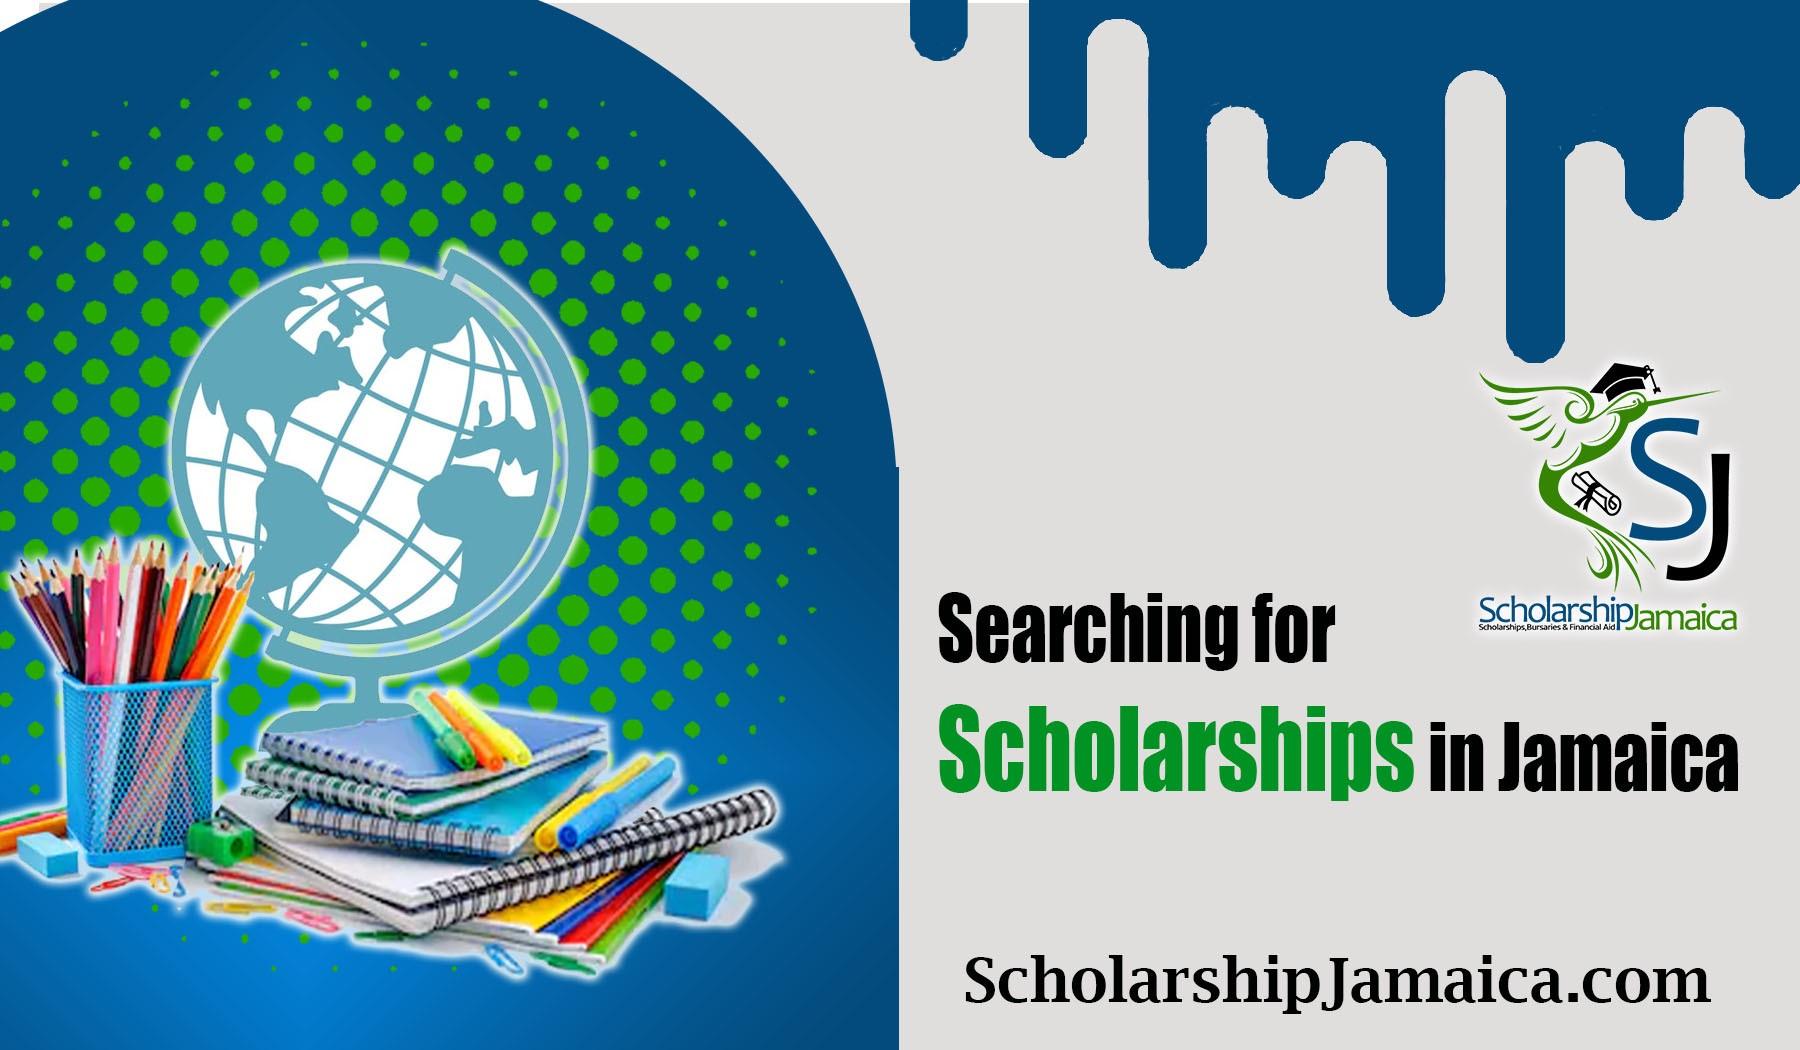 Win Scholarships with ScholarshipJamaica.com